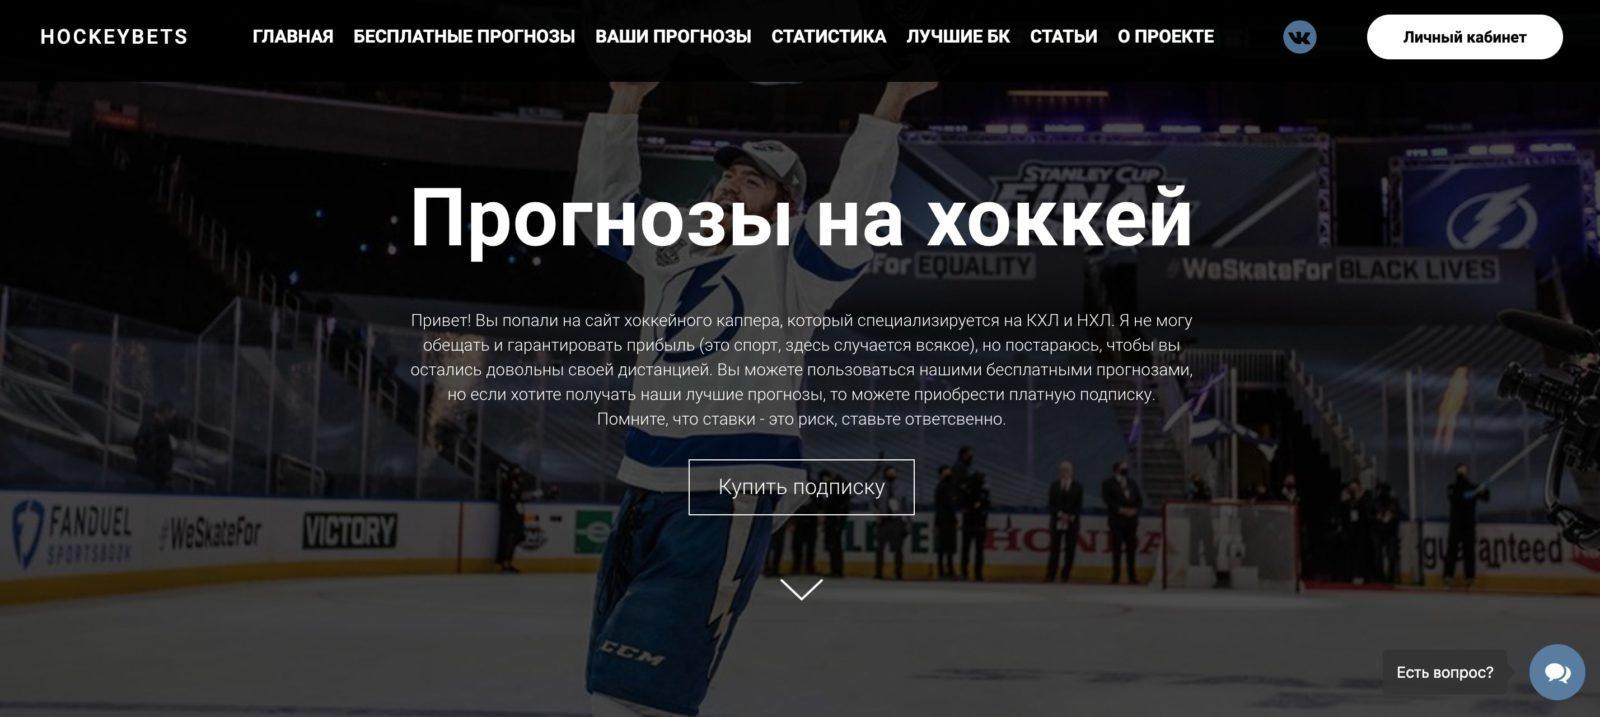 Главная страница сайта Hockey bet ru (Hockeybets ru)